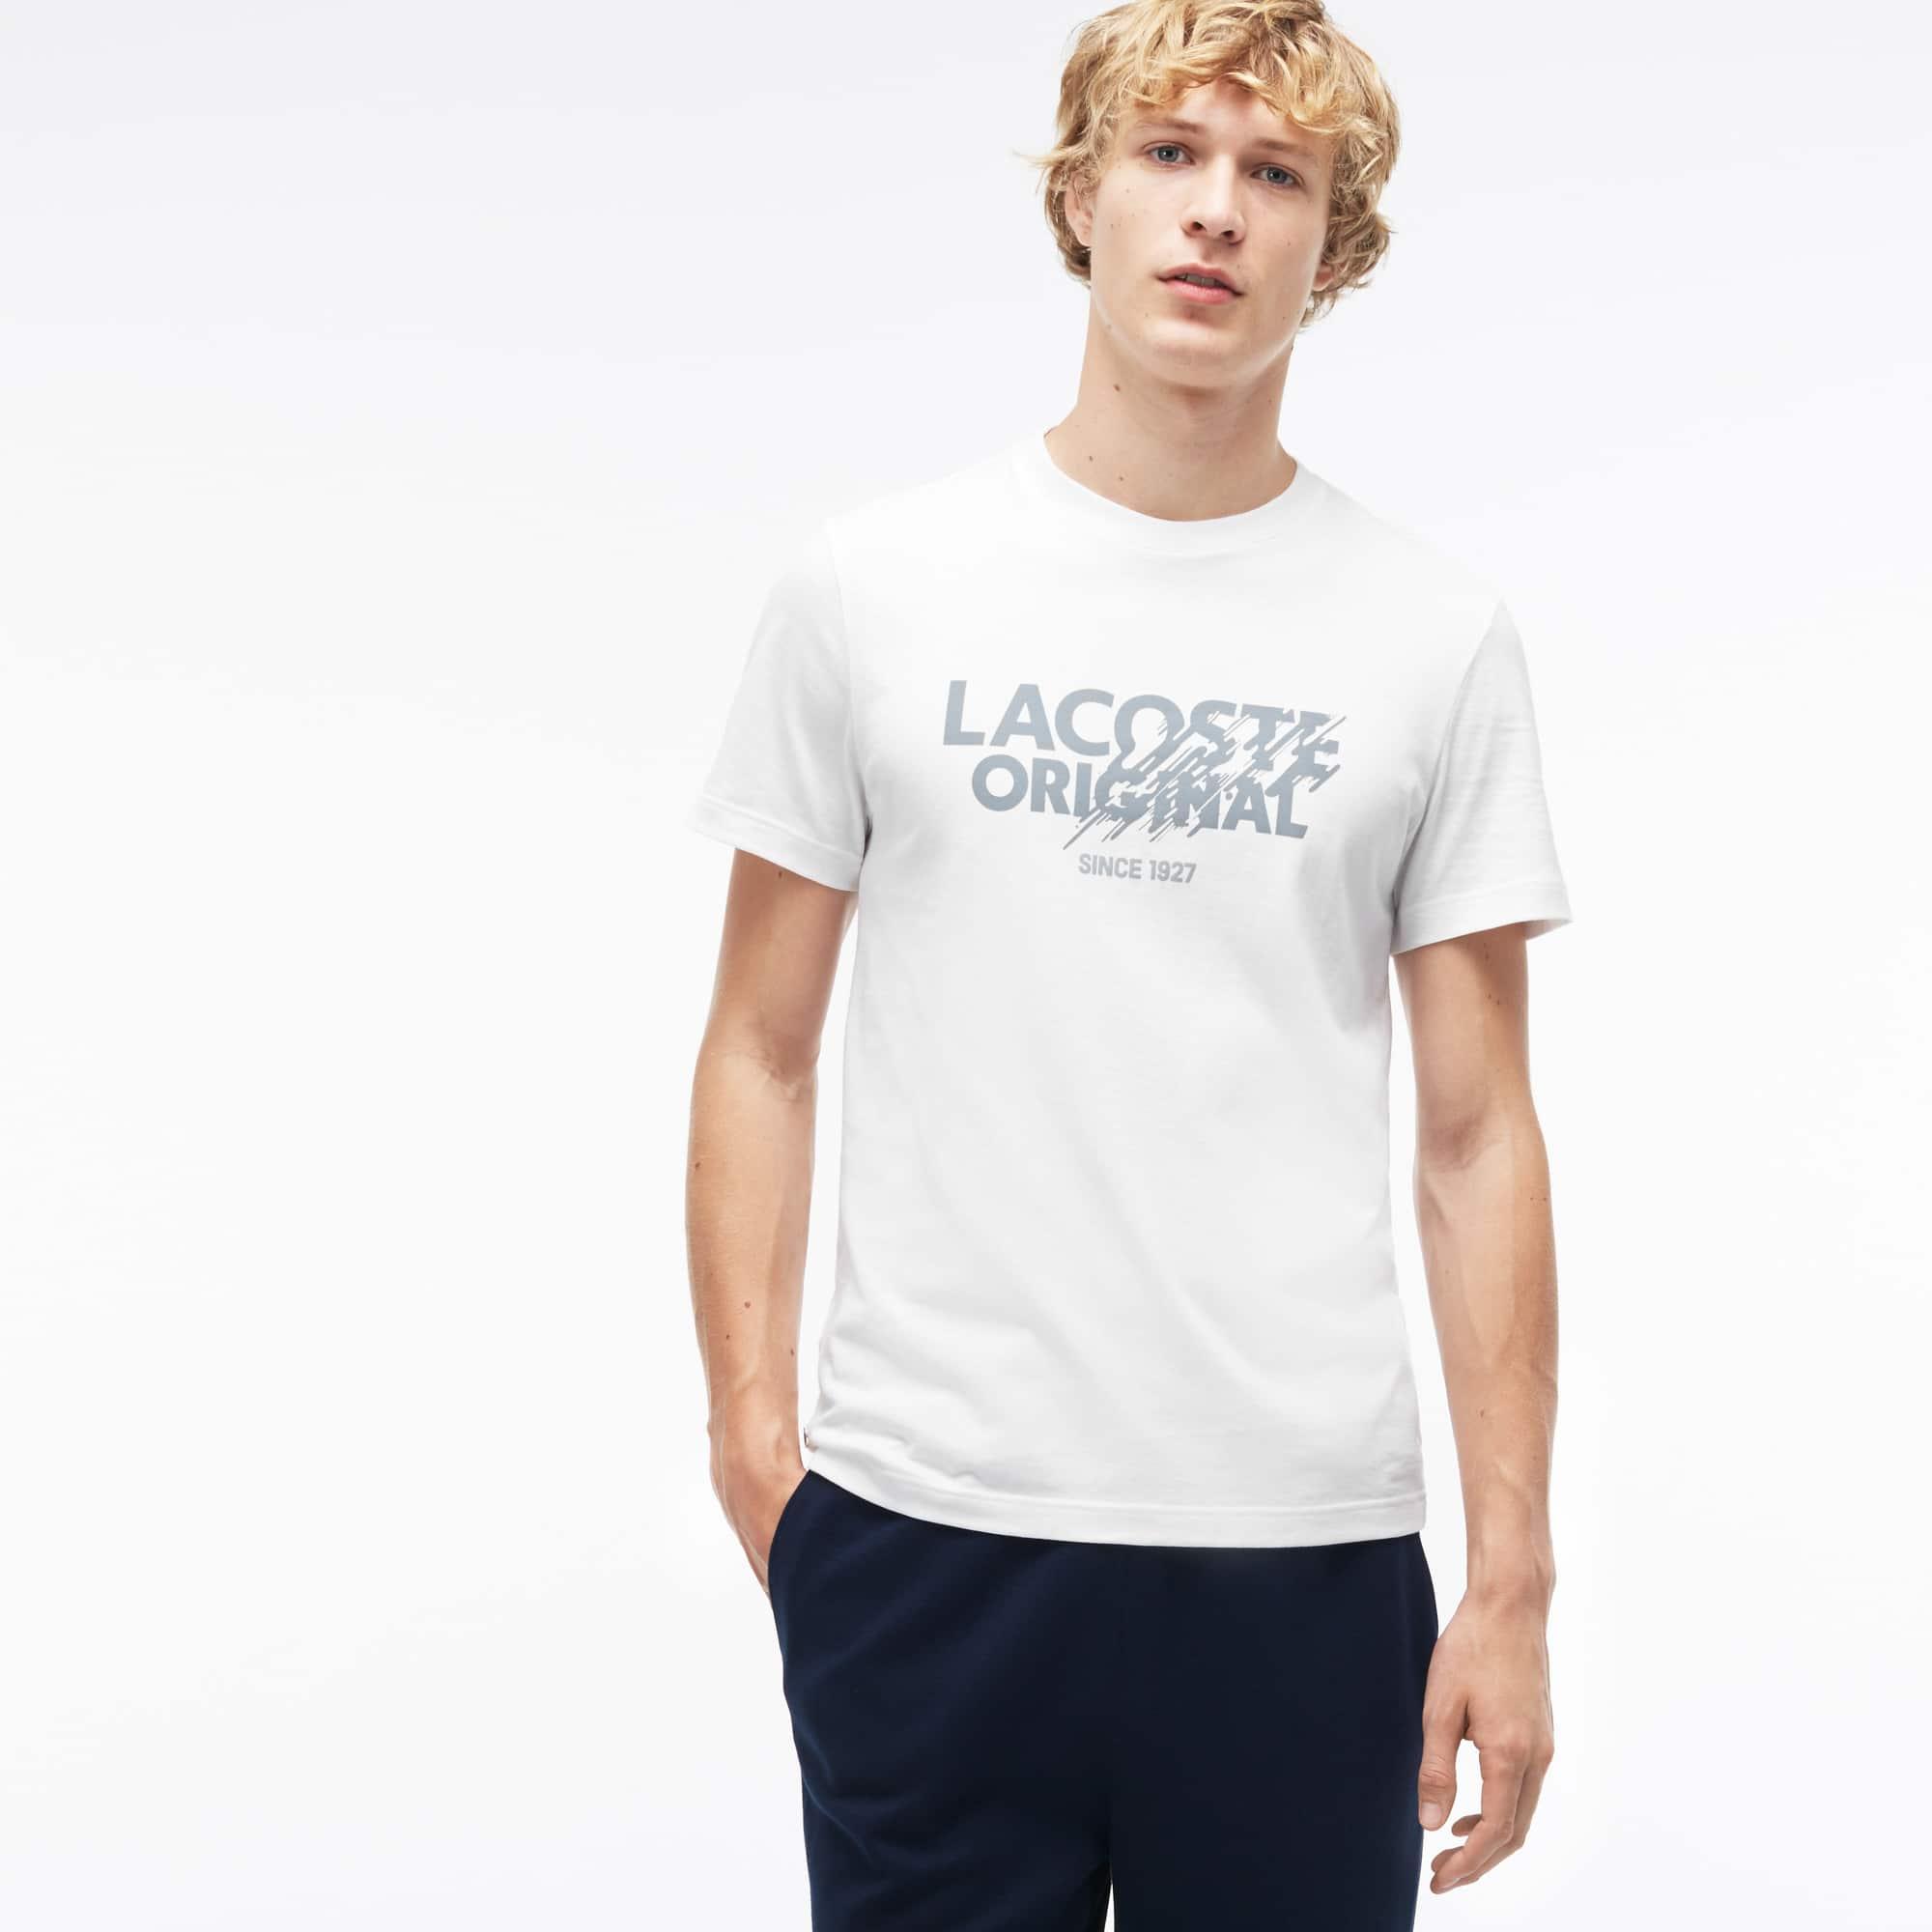 T-shirt a girocollo in jersey con scritta Lacoste Original